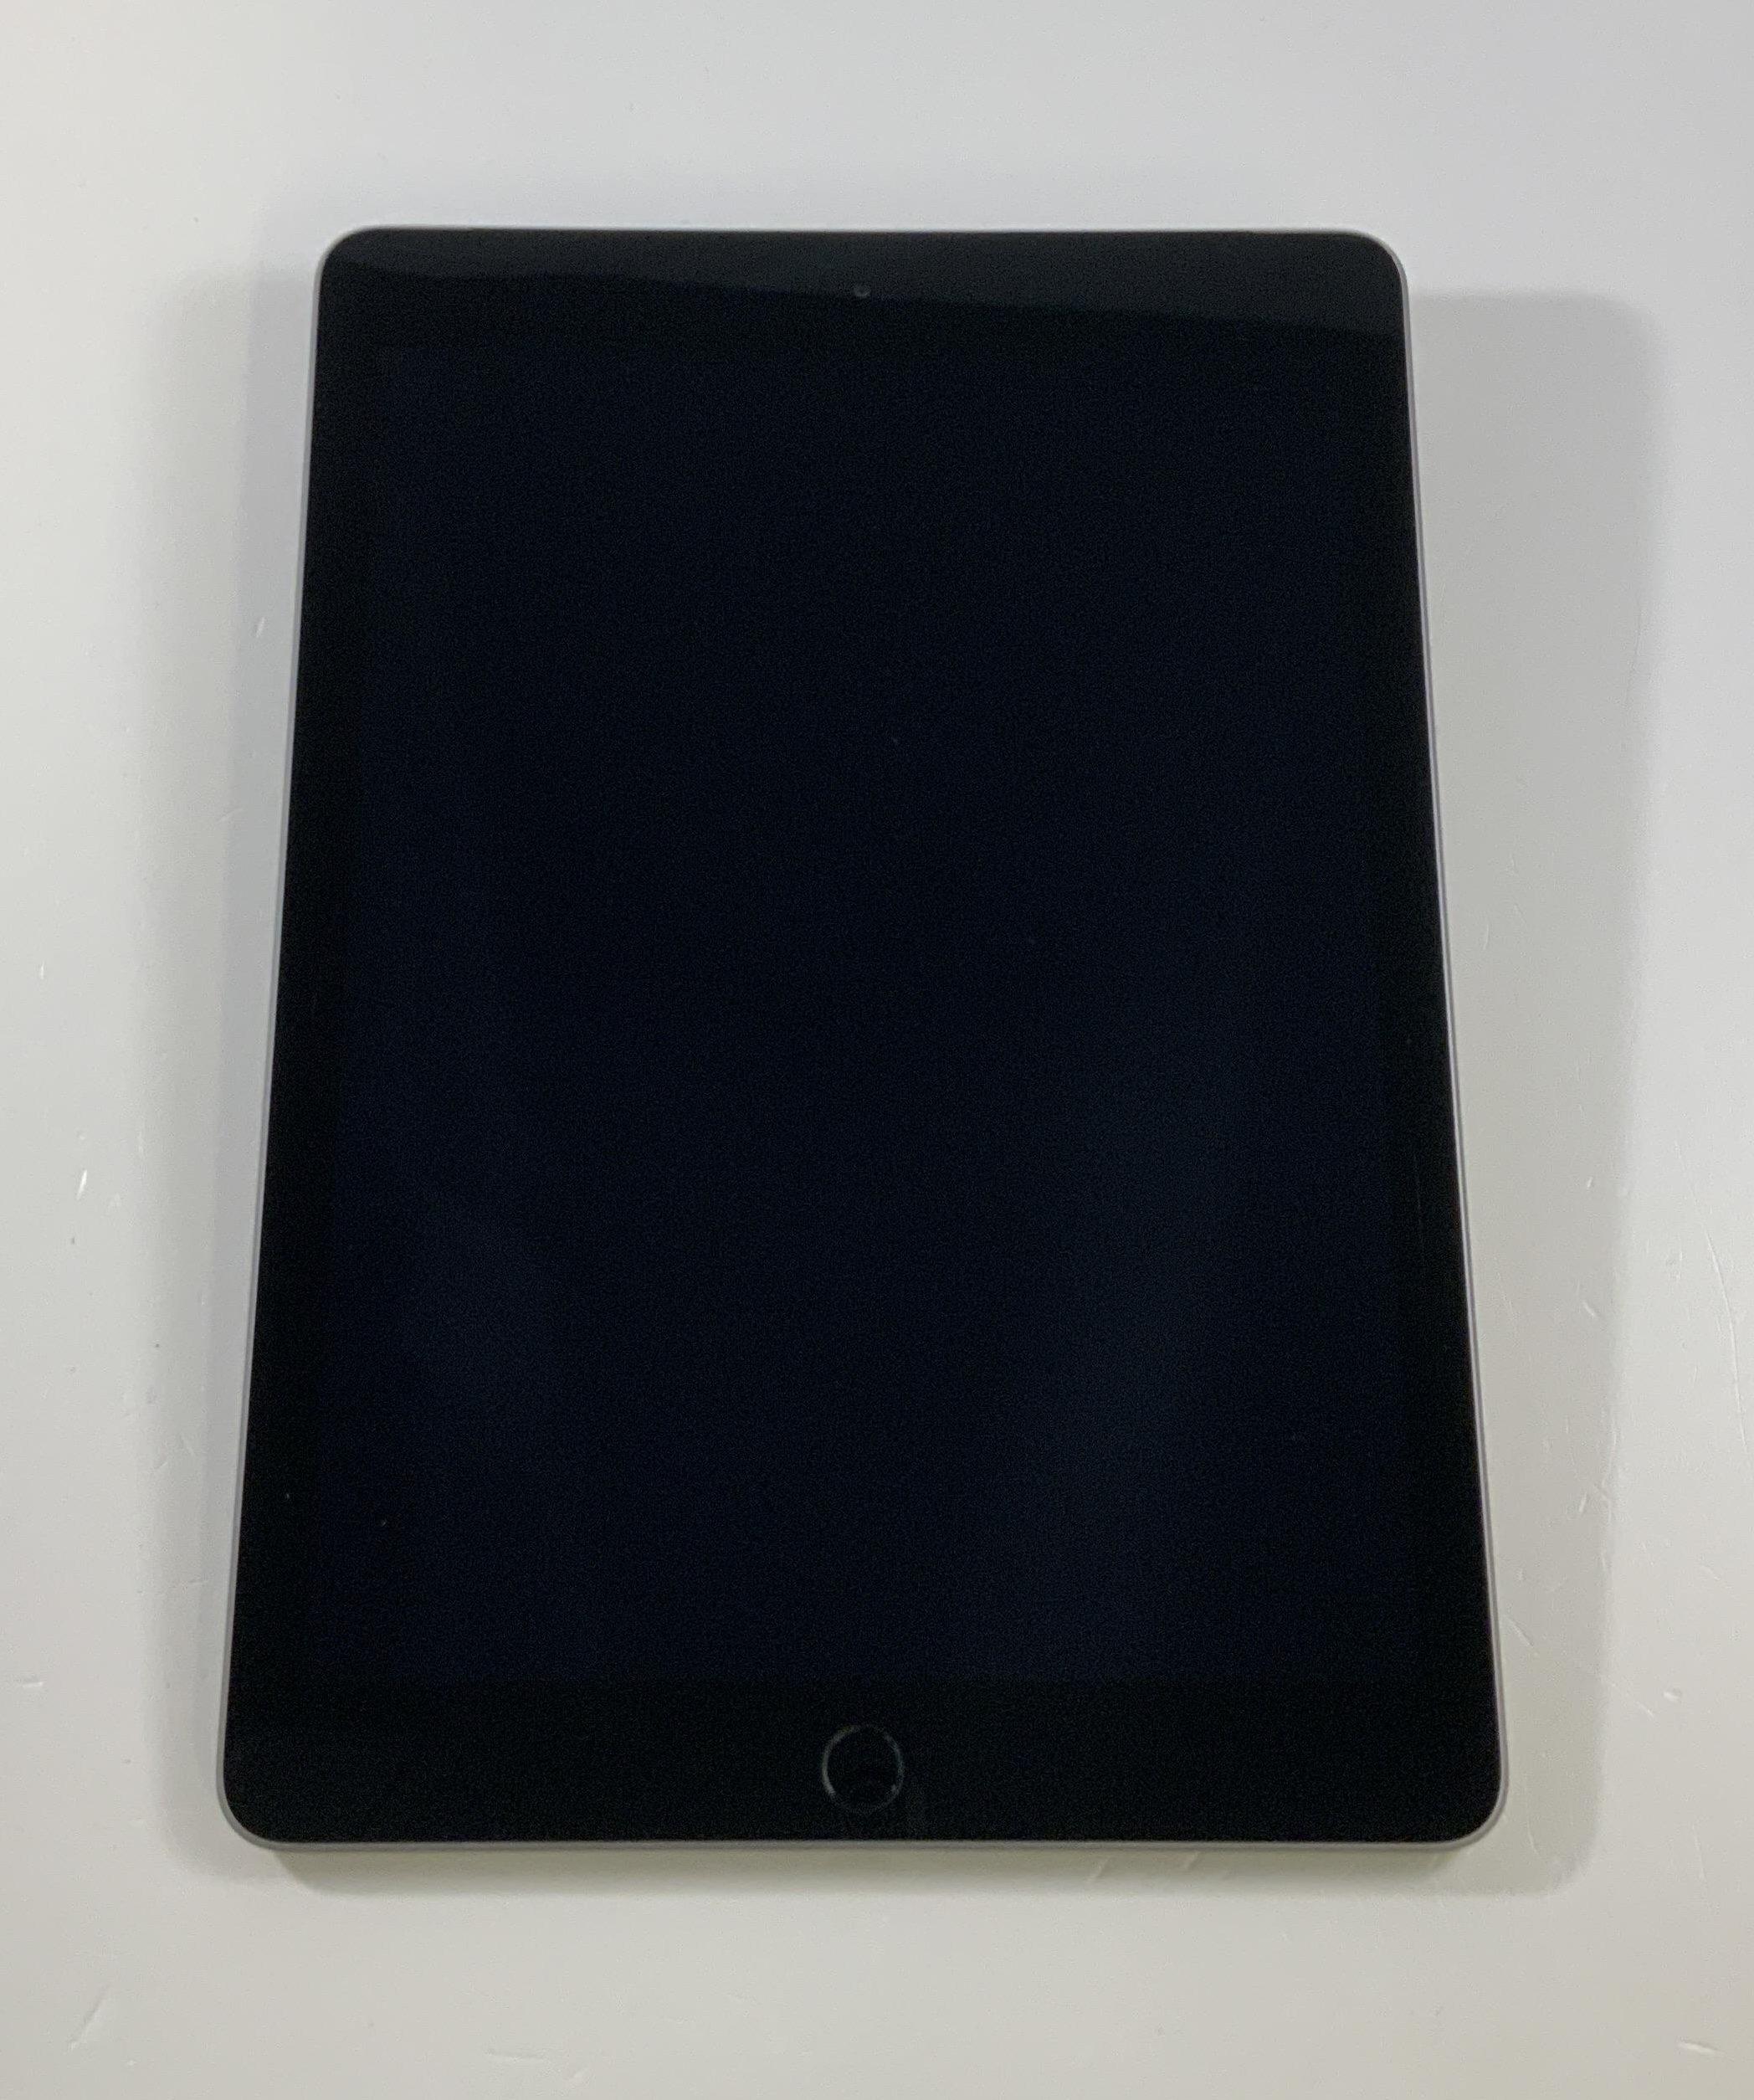 iPad 5 Wi-Fi + Cellular 128GB, 128GB, Space Gray, imagen 1